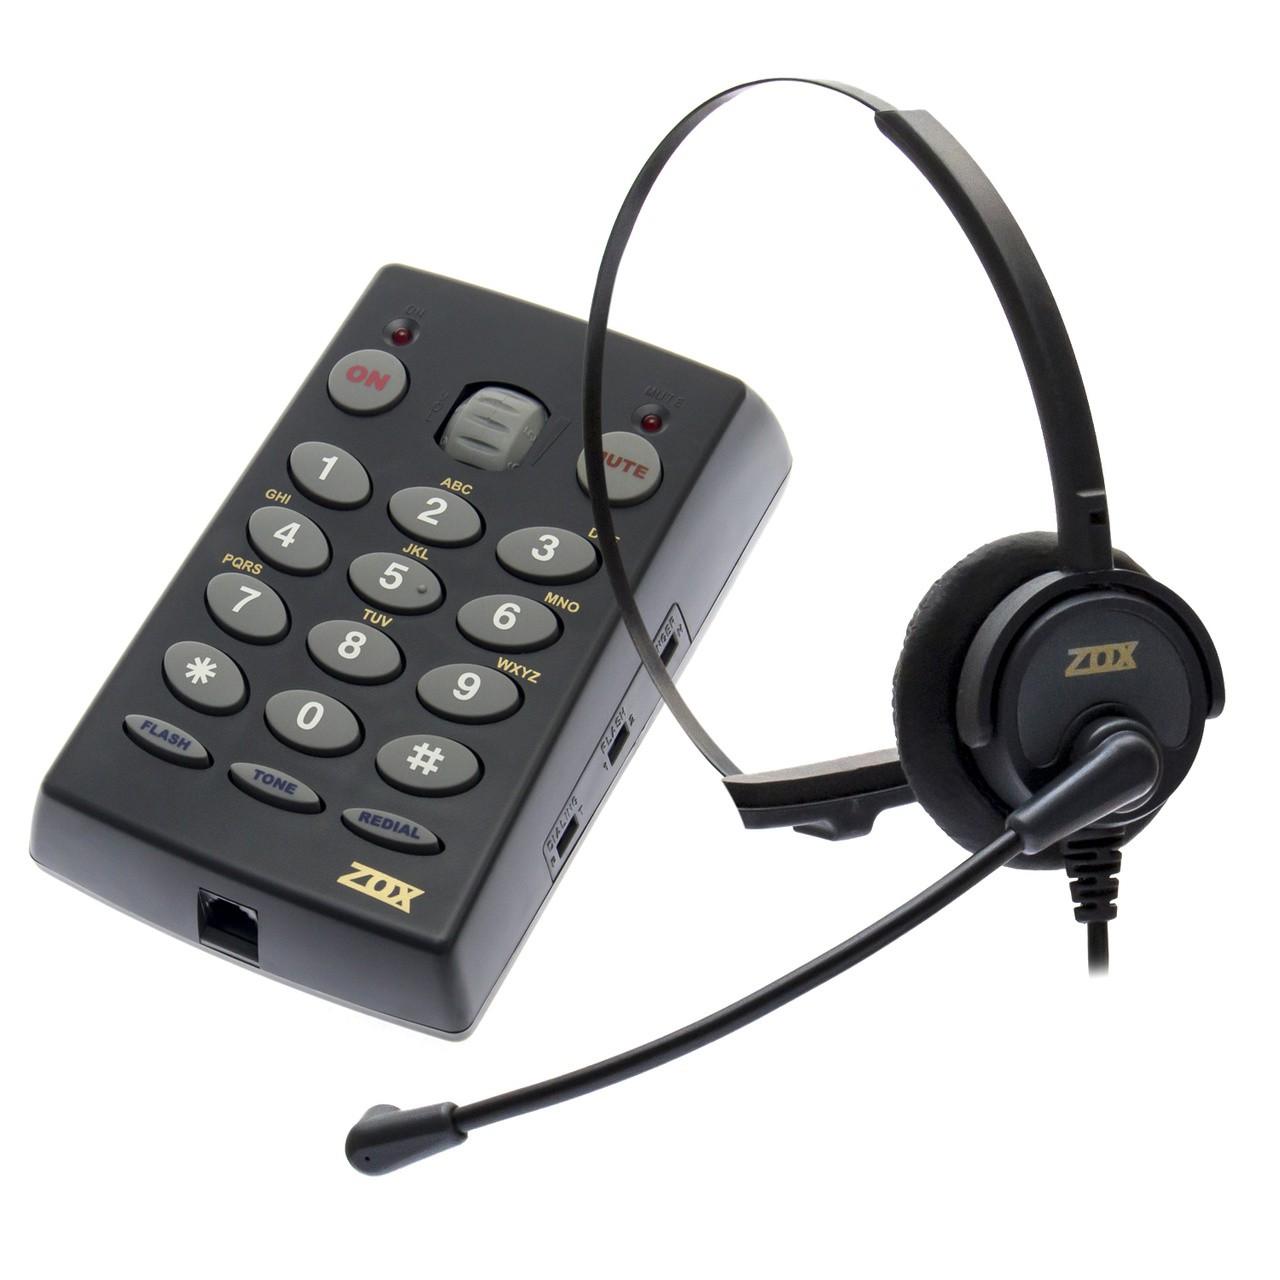 Headset com Base Discadora TZ-30 - Zox